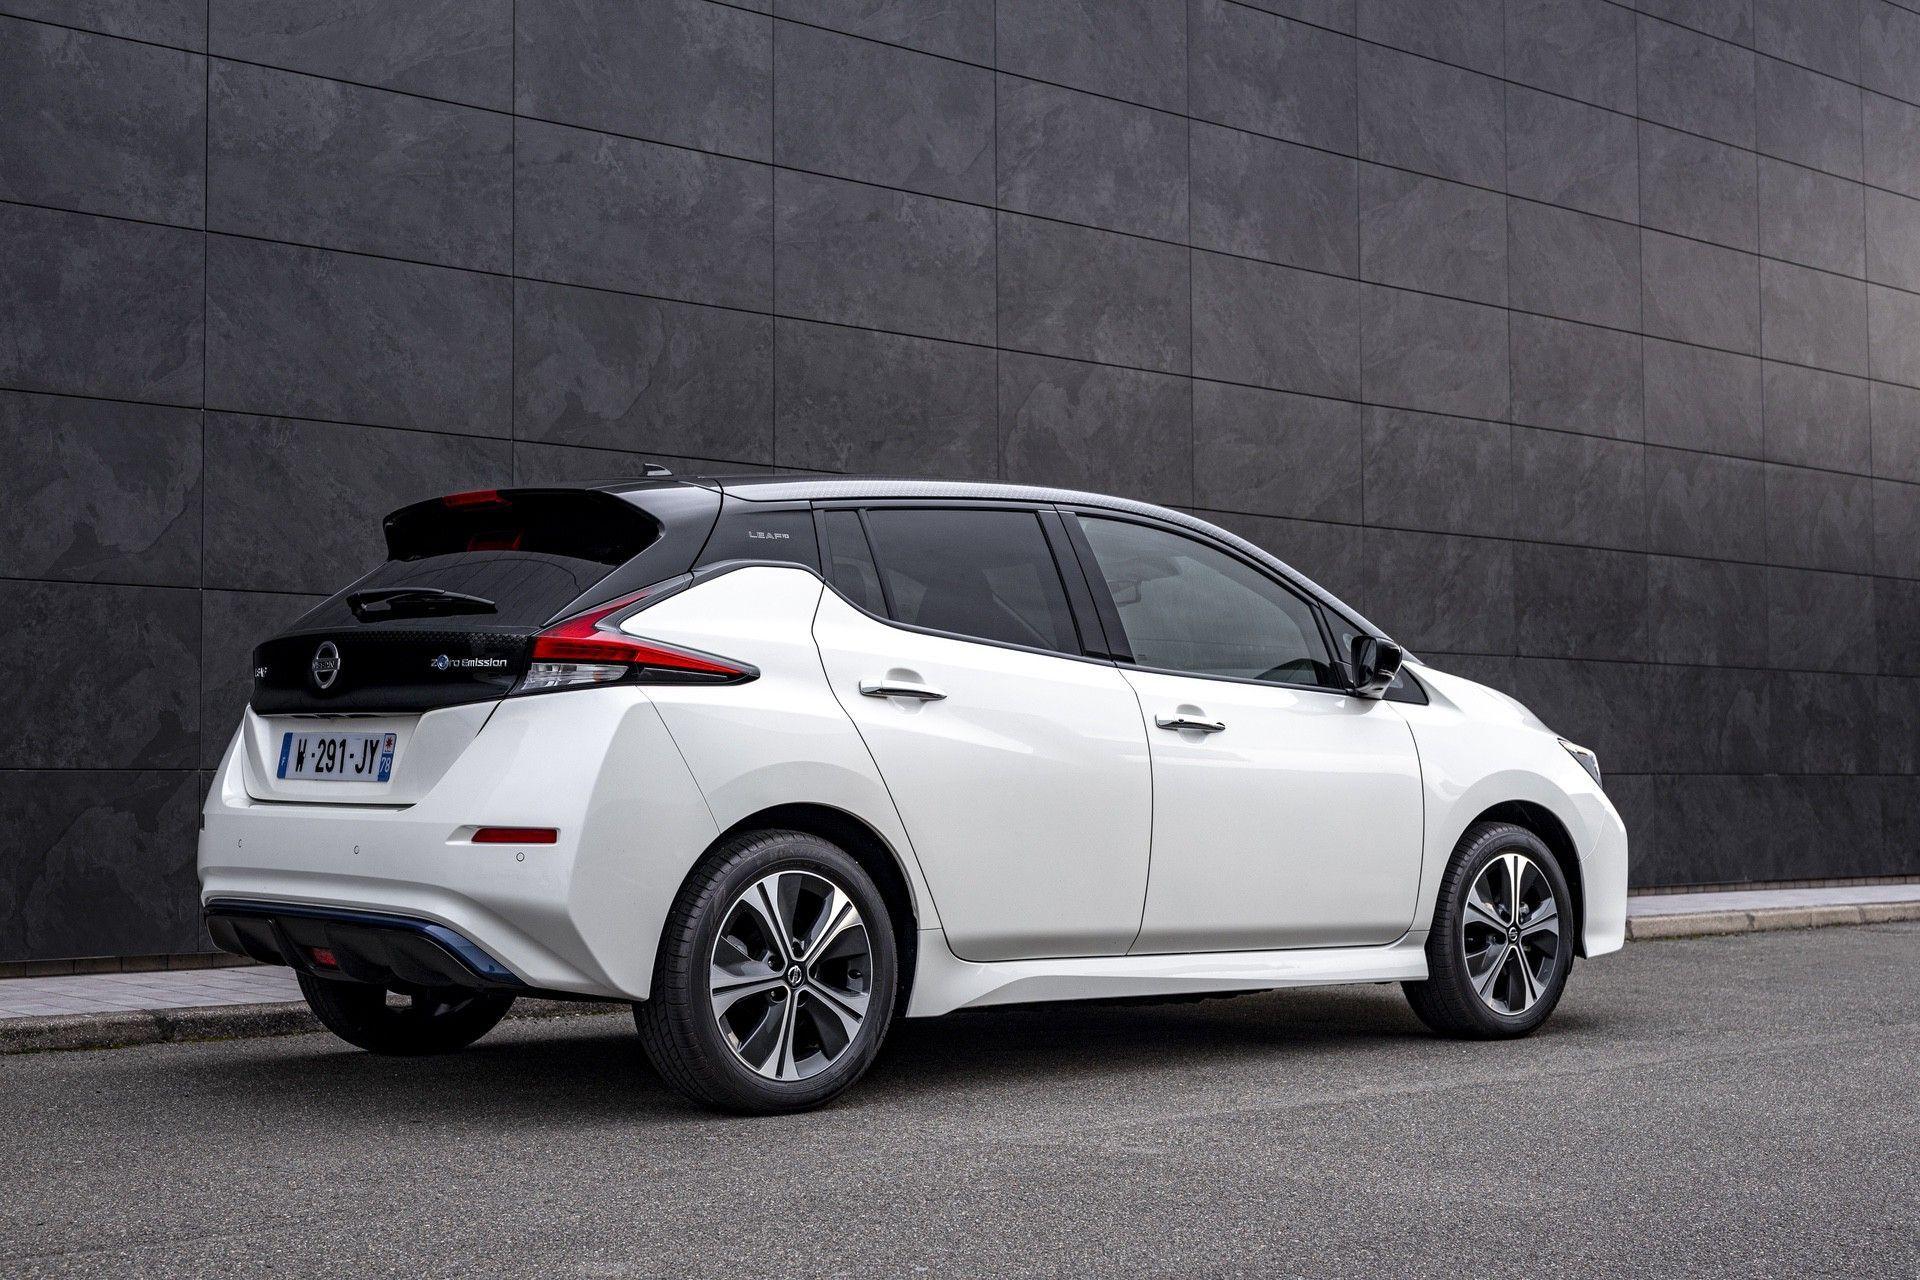 Nissan_Leaf10_special_edition-0008